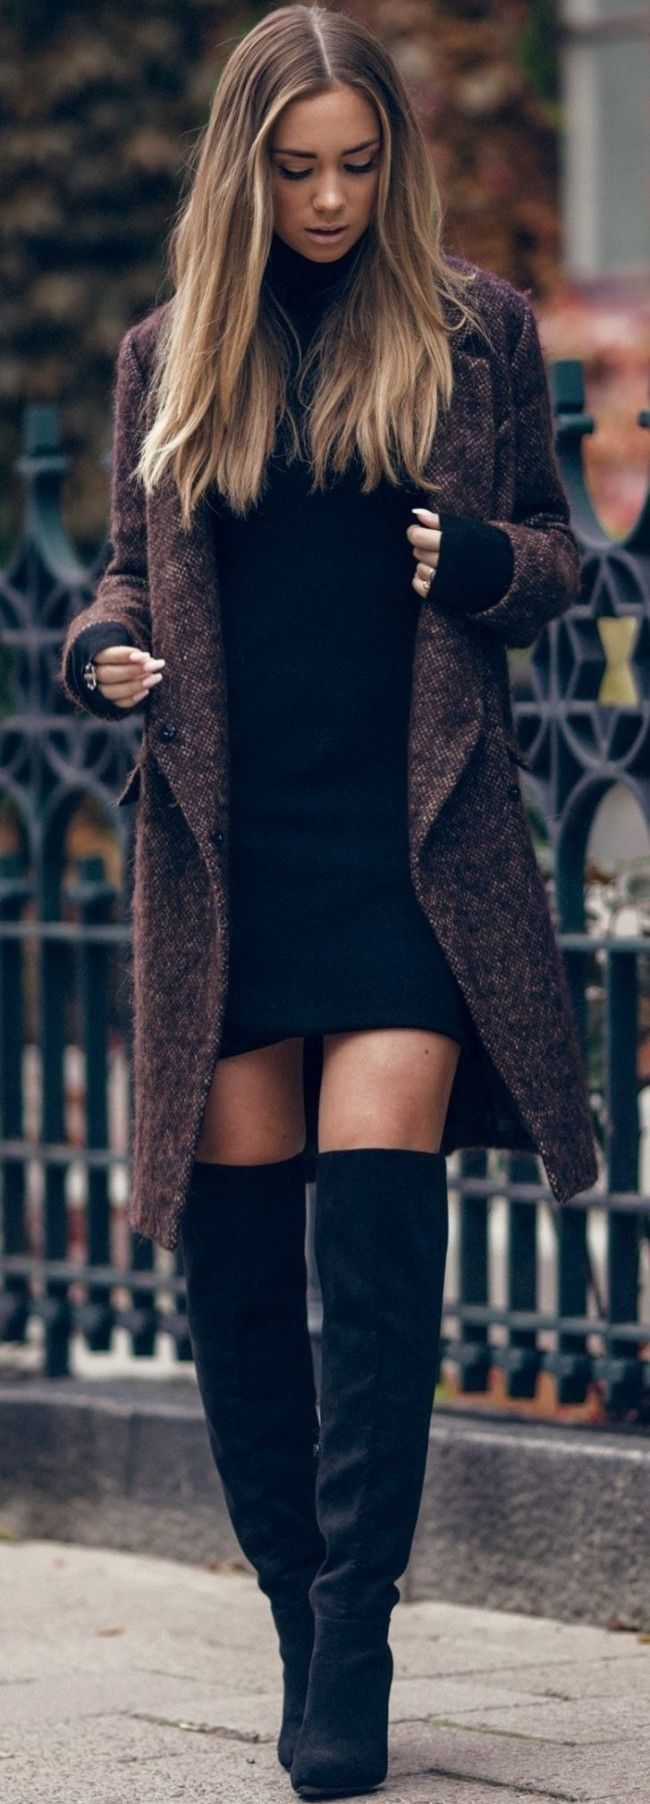 Lisa Olsson Black Thigh High Overknees Fall Street Style Inspo #lisa #lisa